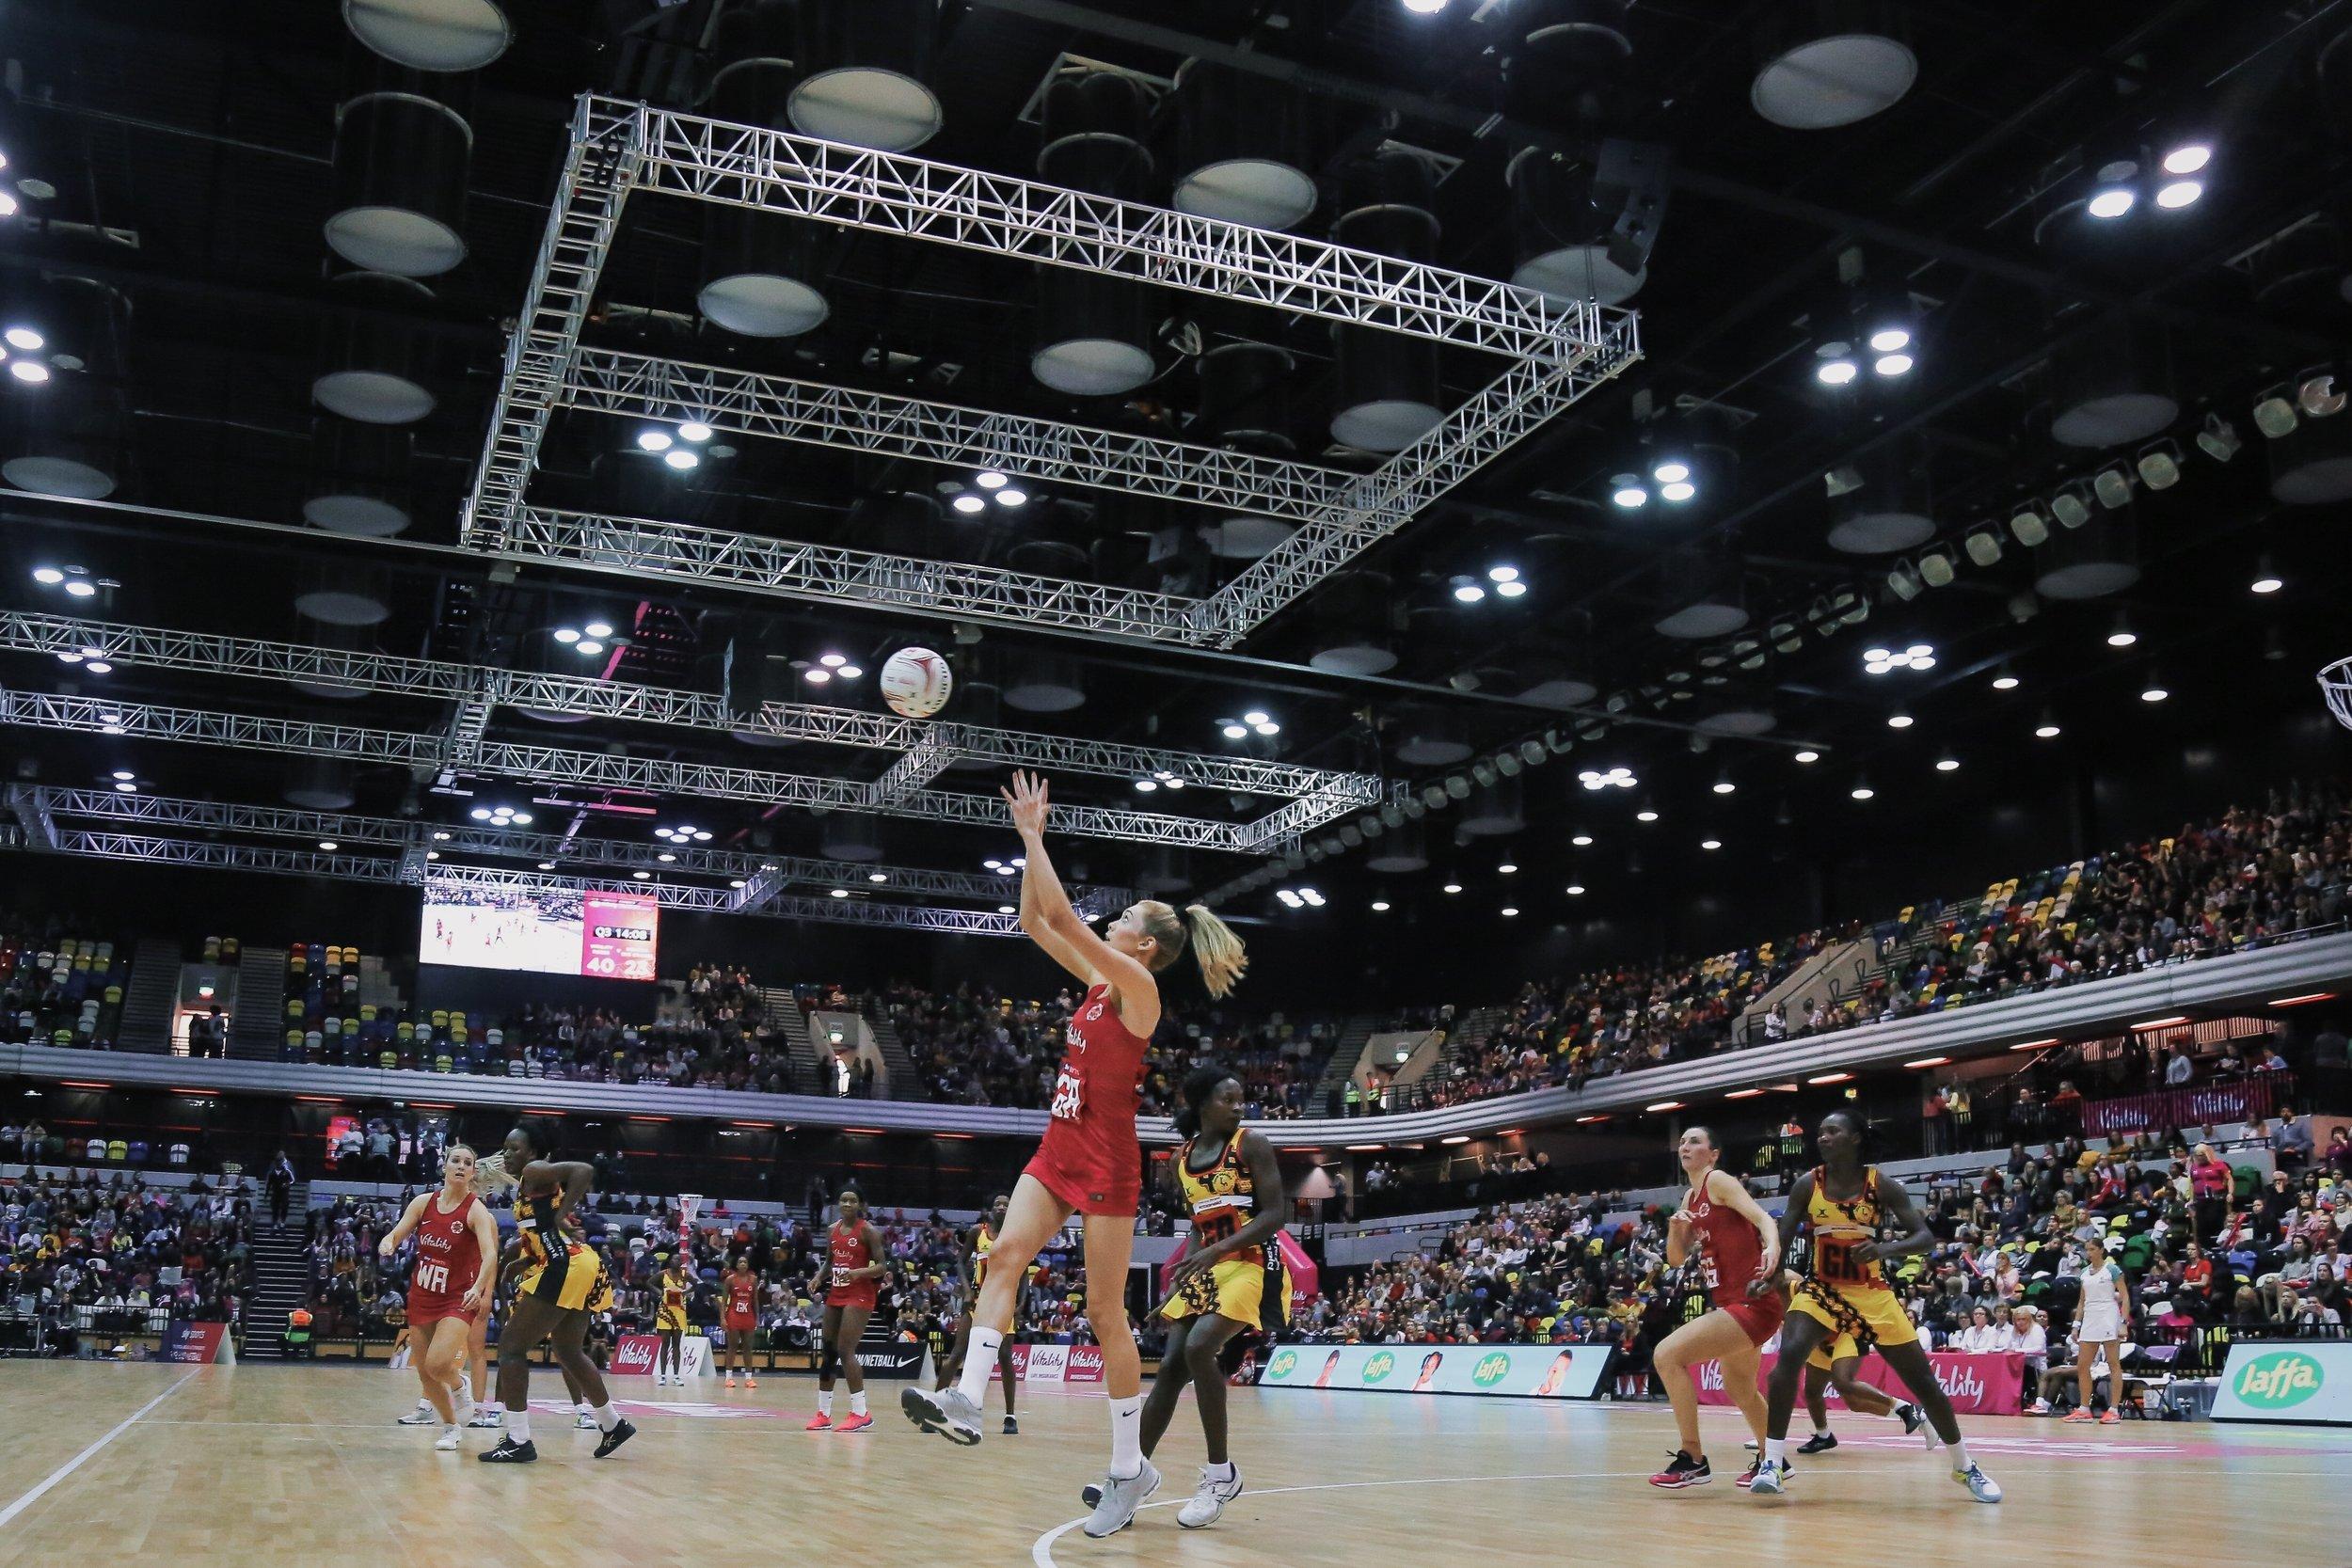 womens-netball-sport-england-uganda-international-series-19.jpg